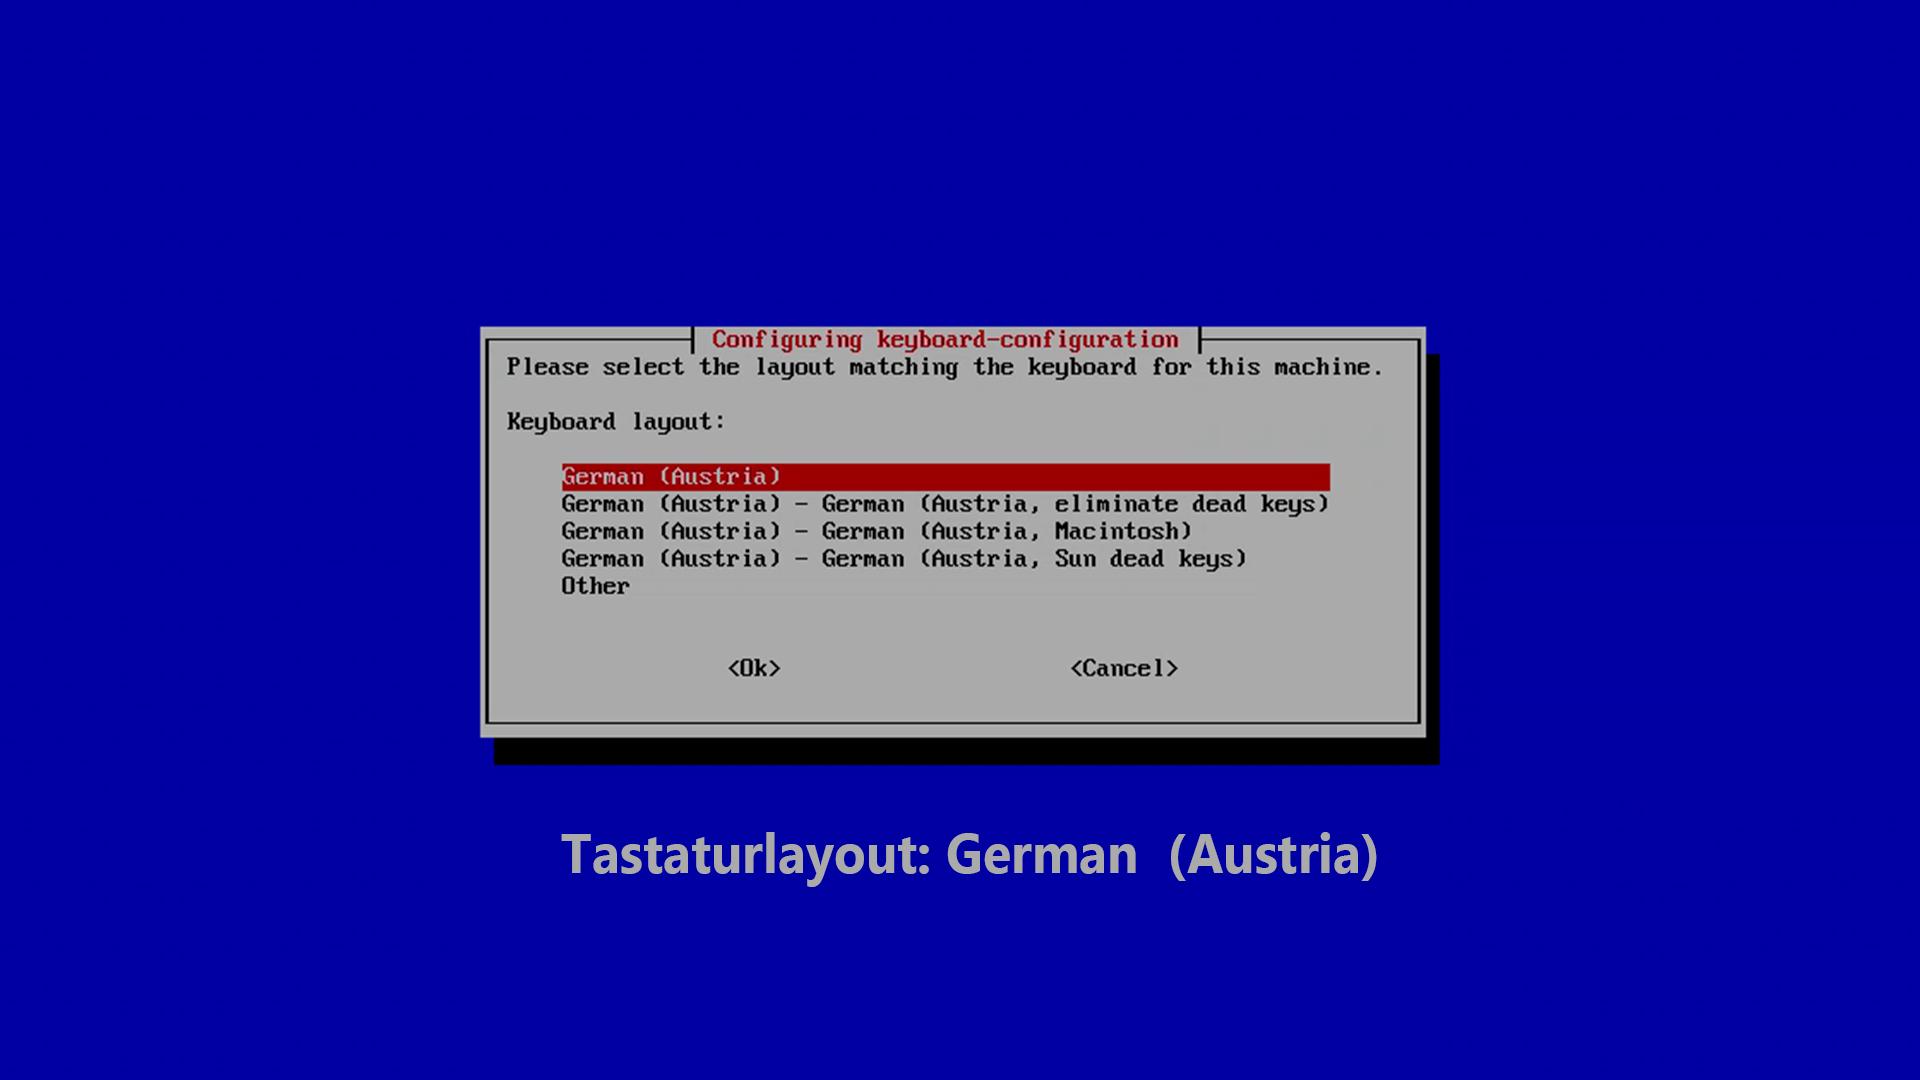 DigitaleWelt RetroPie Anleitung - Tastaturlayout - German (Austria)